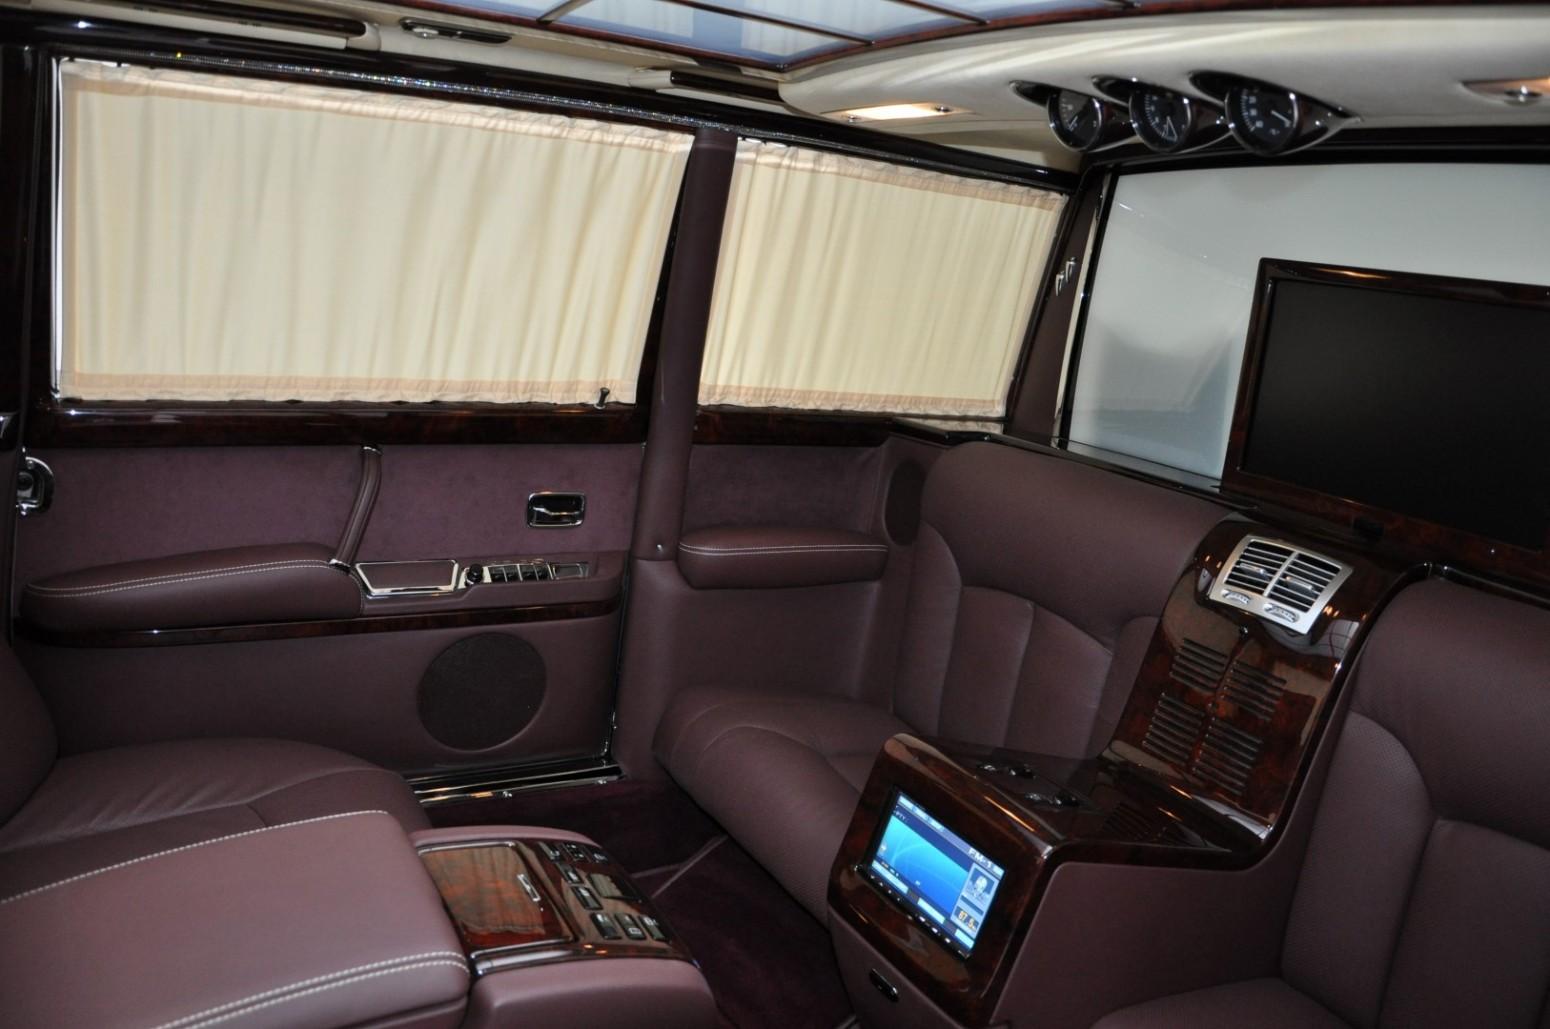 Mercedes-Benz 600 Pullman interior